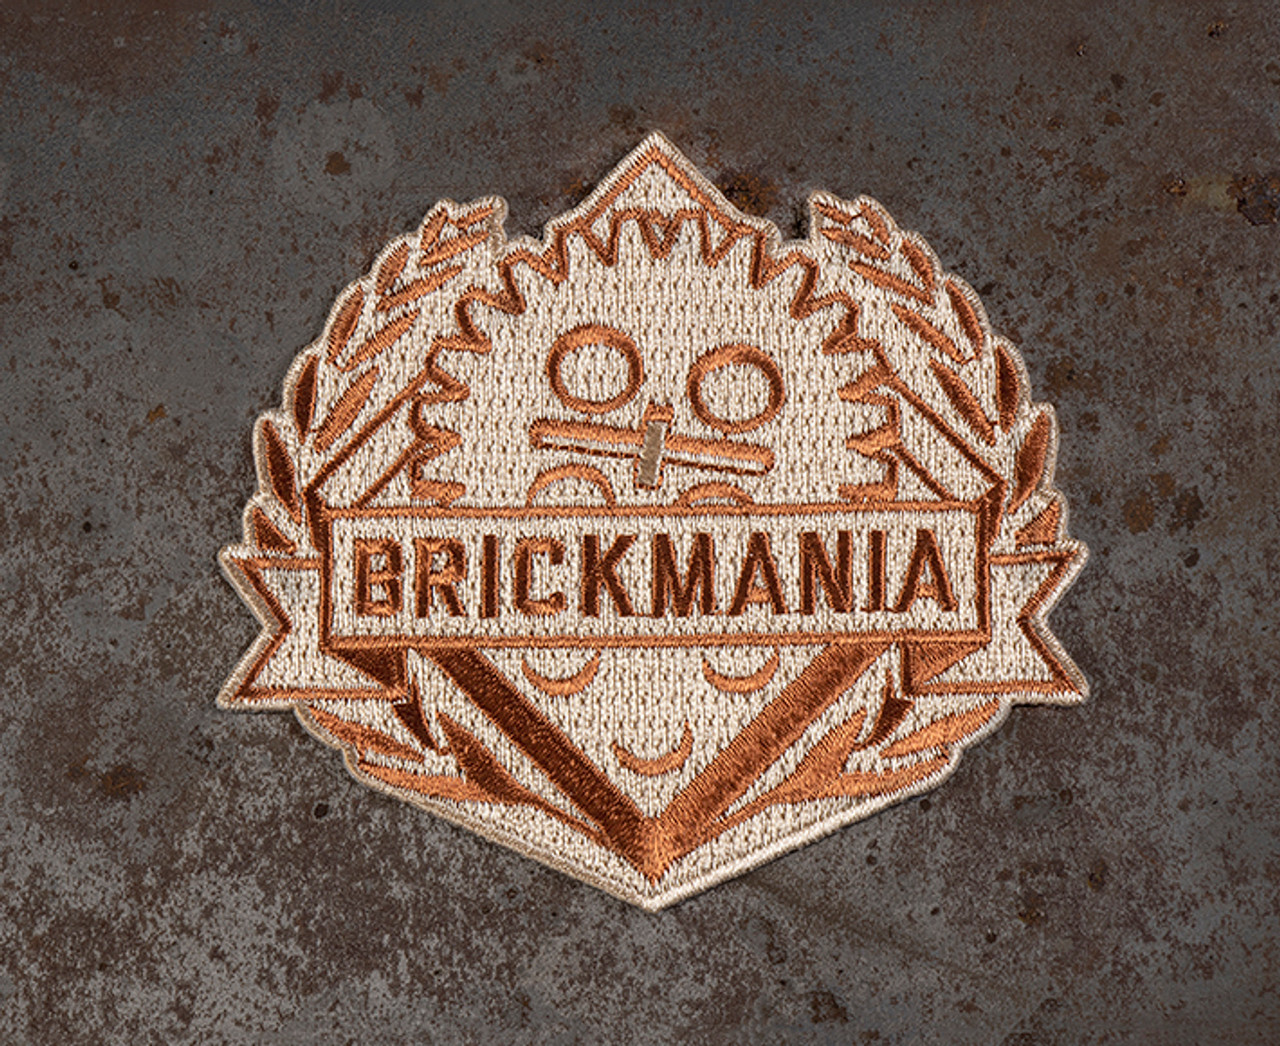 Brickmania Subdued Logo Patch